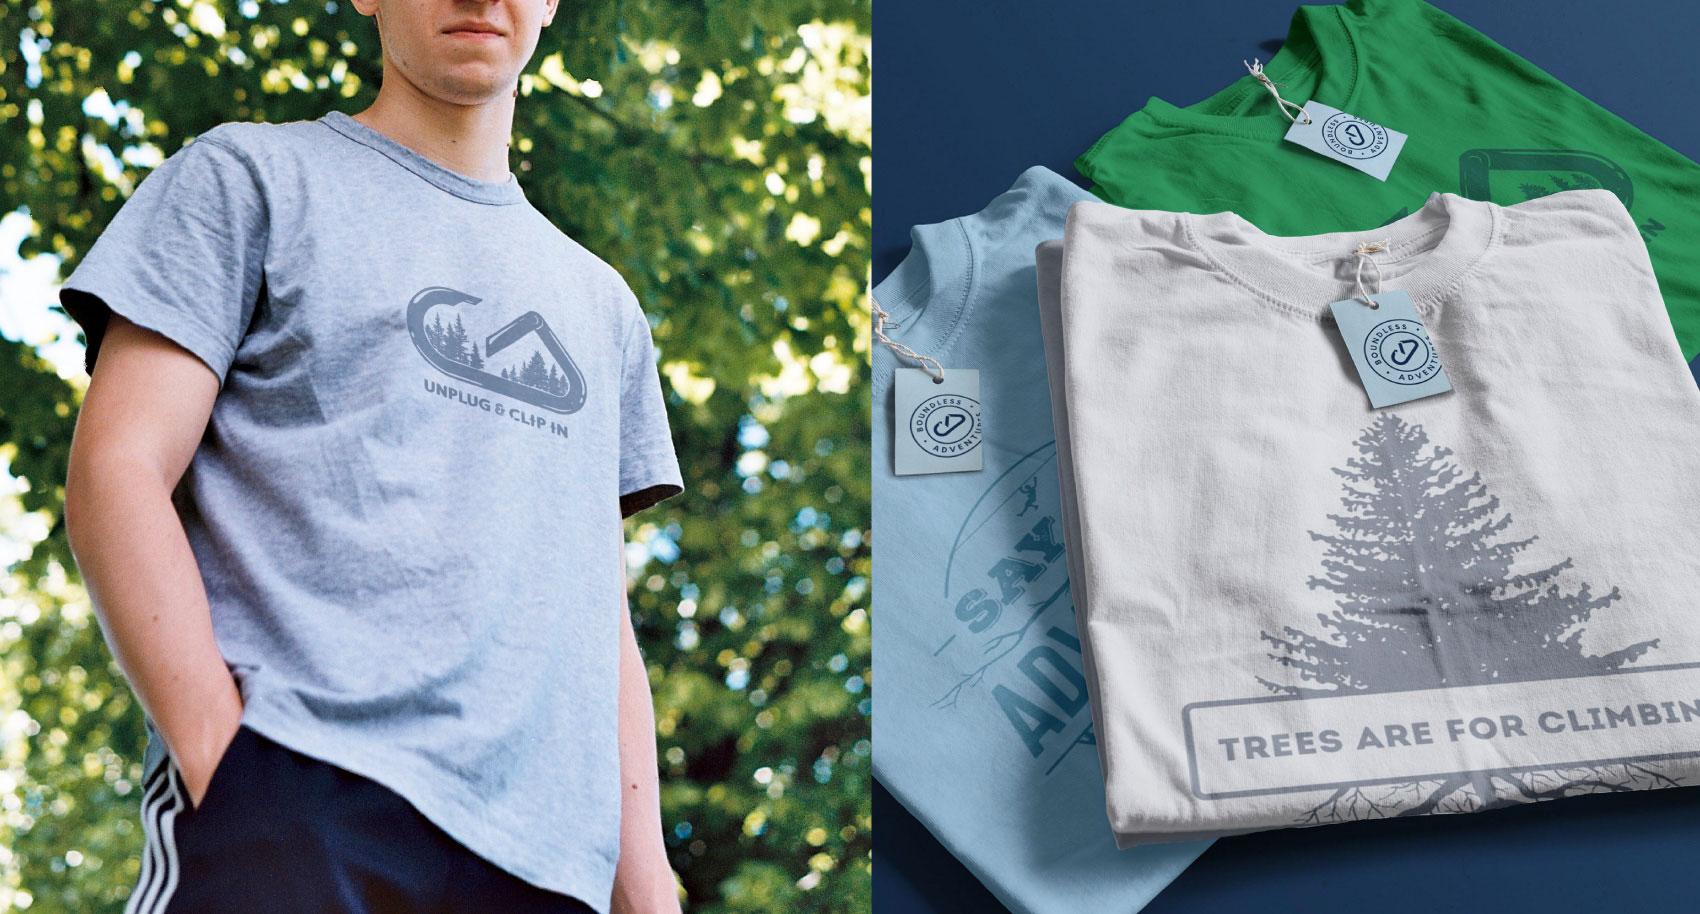 Merch (tshirt) designs for Boundless Adventures